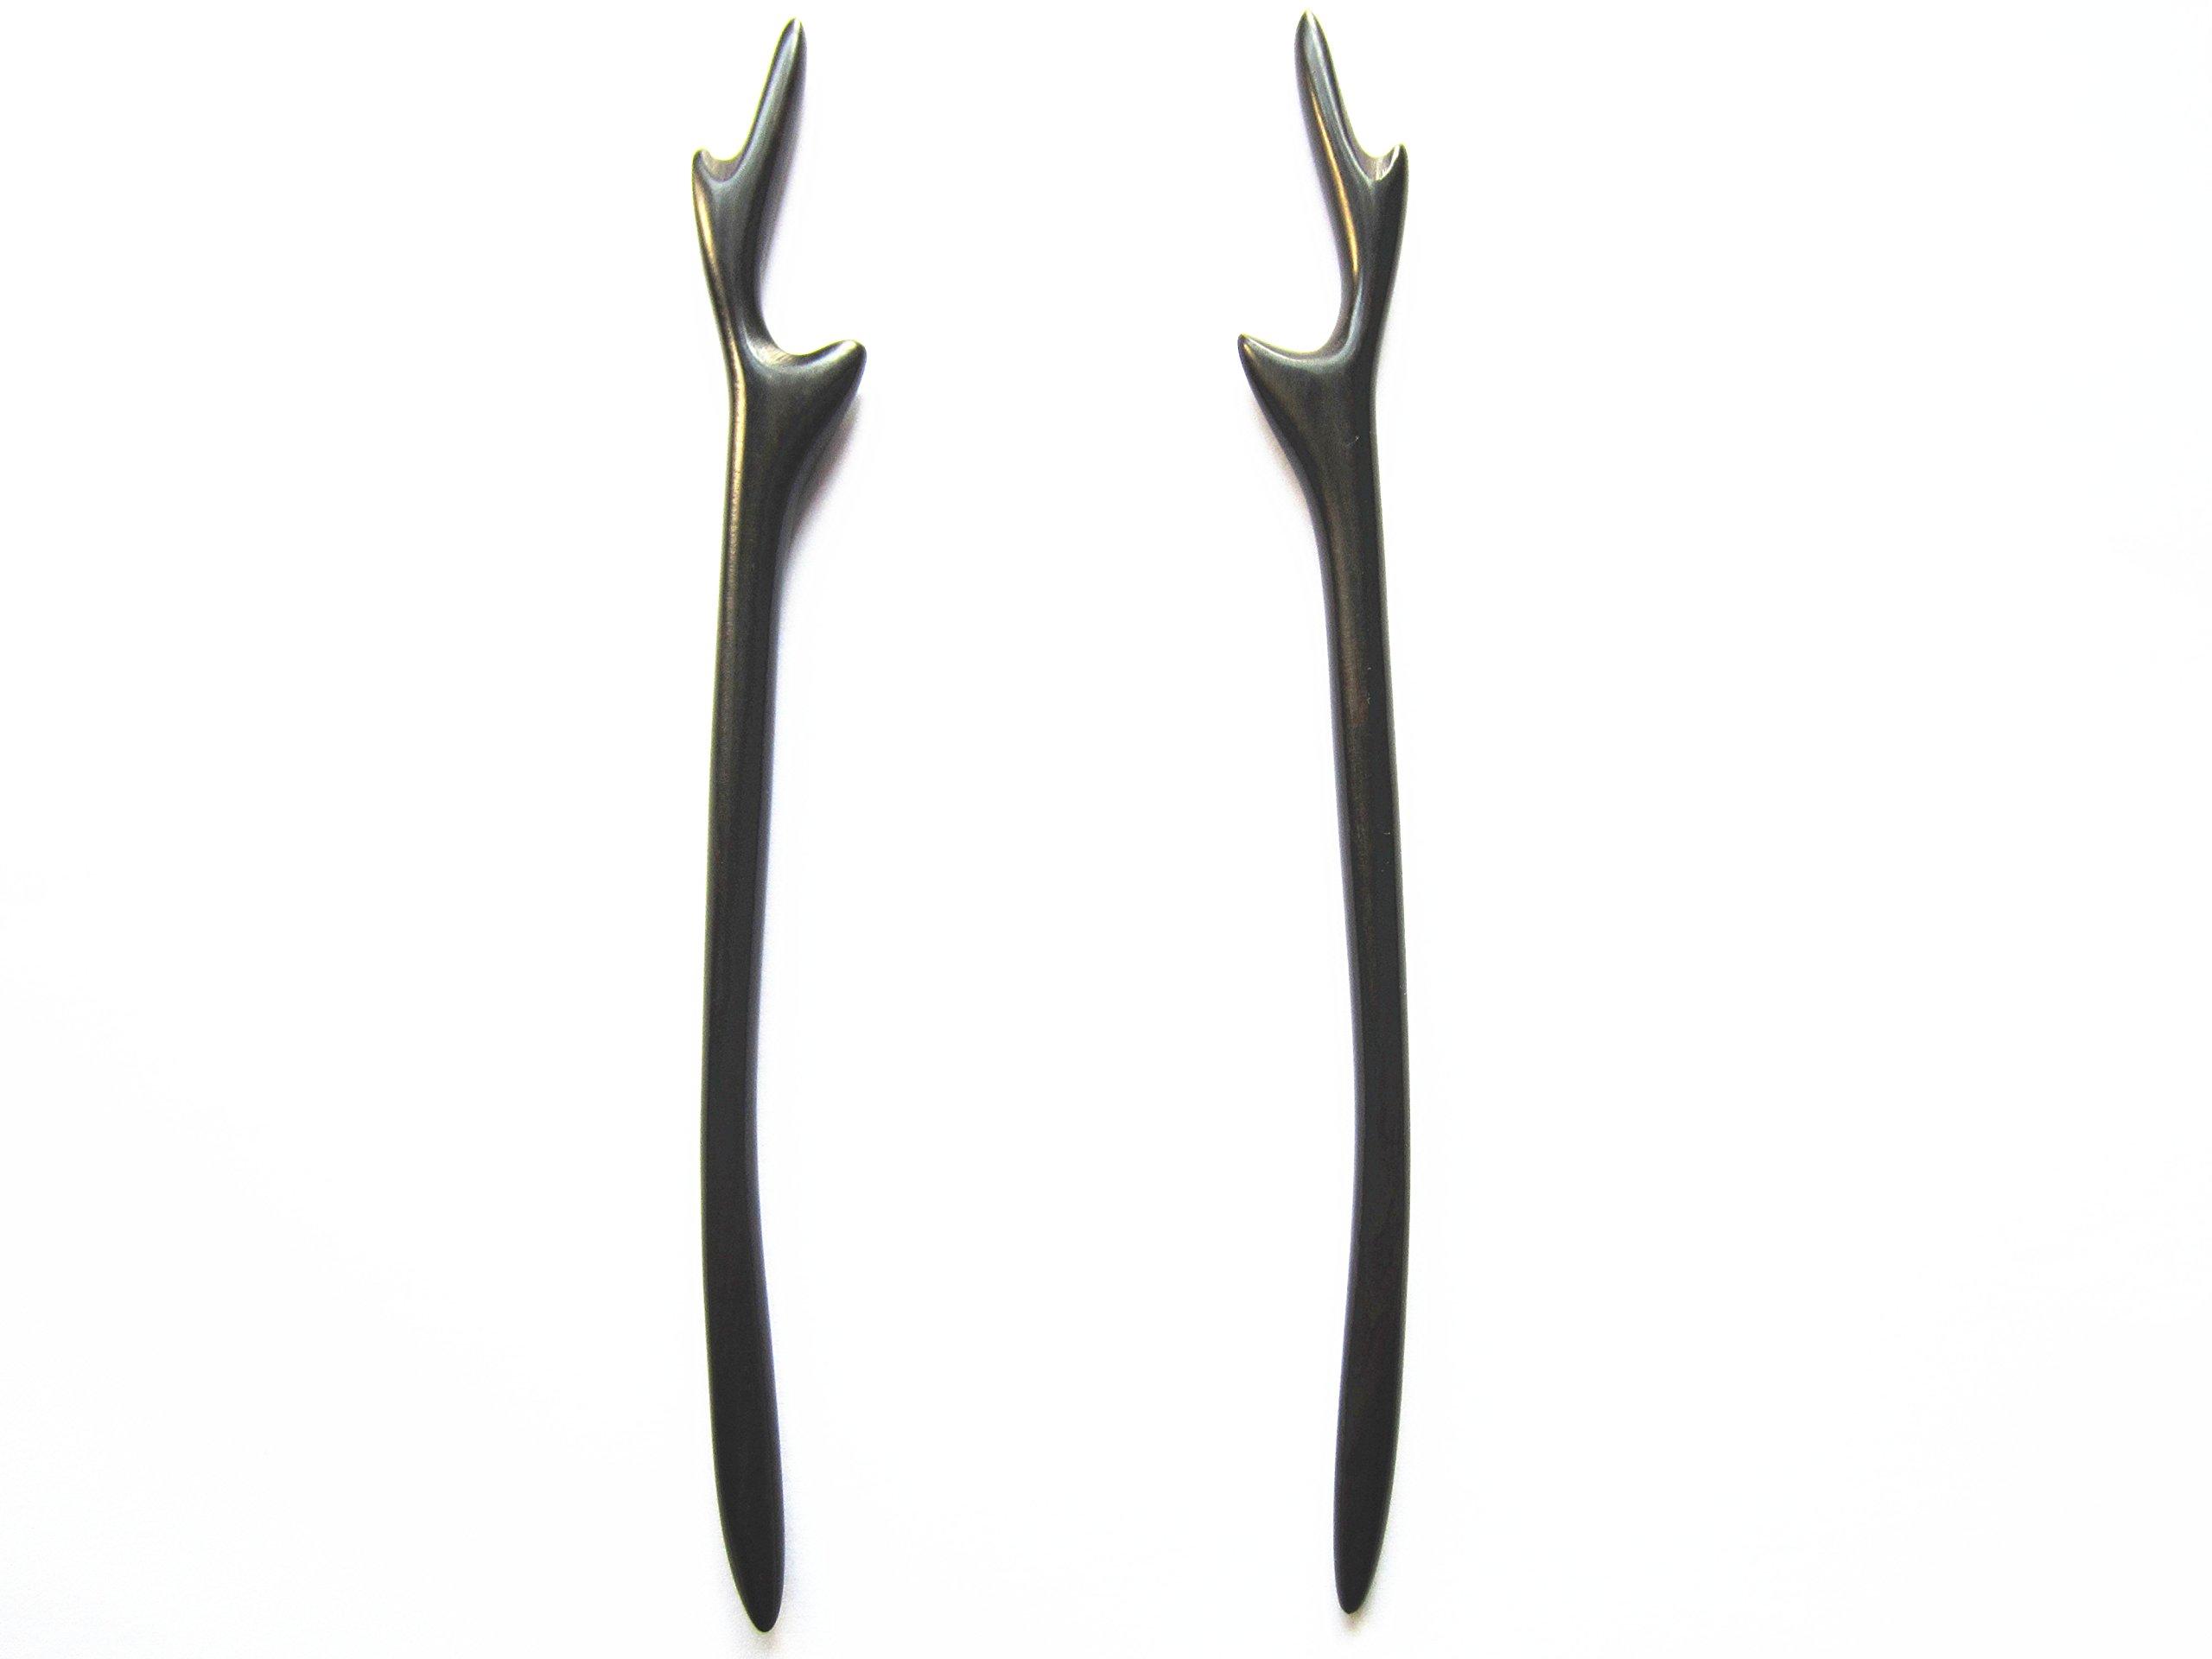 Myhsmooth Zz-bg-antlers 2 Count Hair Sticks Natural Black Sandalwood(ebony) Handmade Carved Hair Clip Shawl Hair Pins Pack of 2 Pcs :Antler